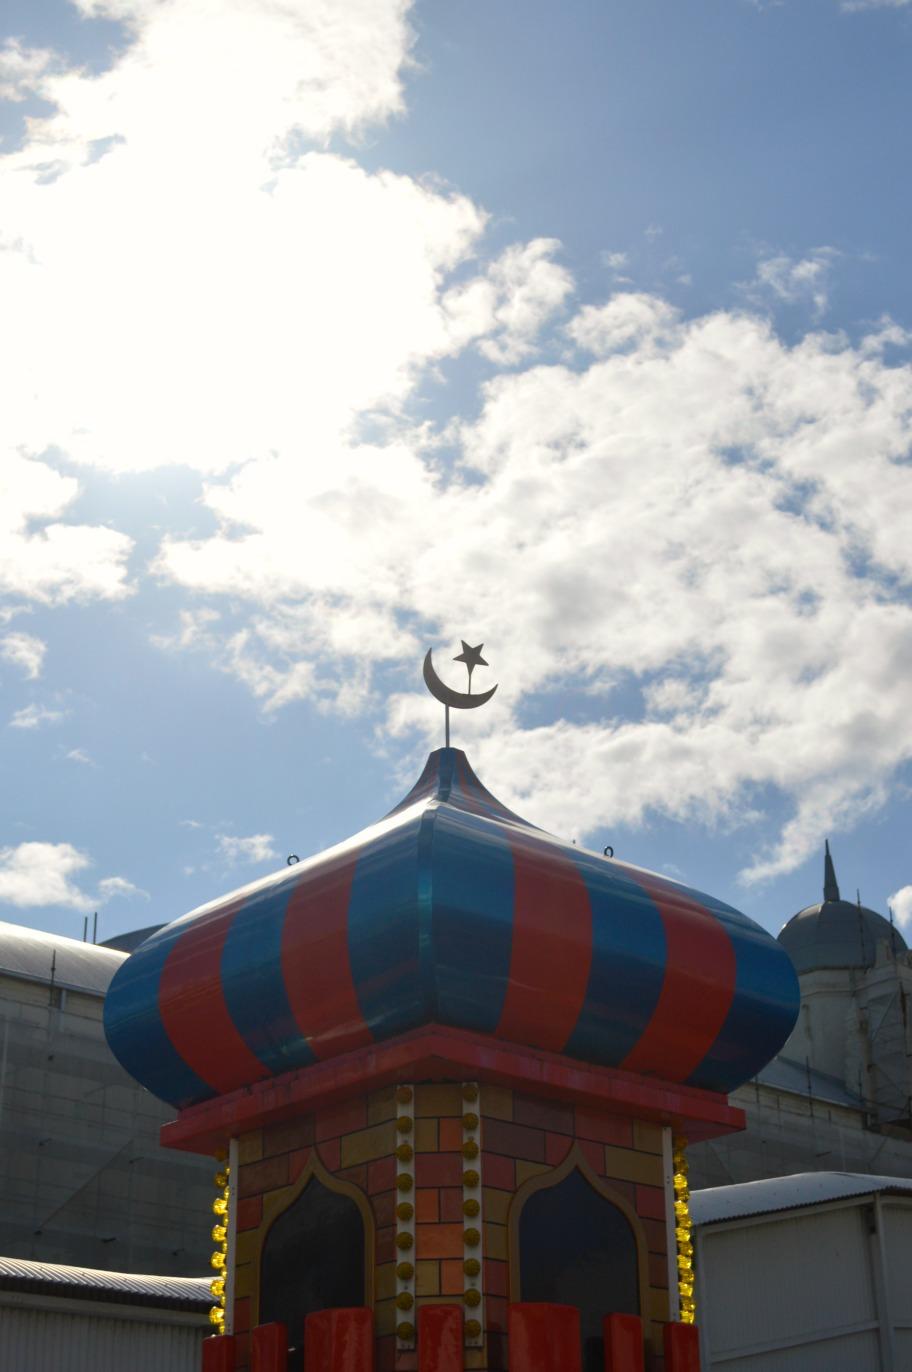 #fairy tale #Sindbad #maerchen #lunapark #melbourne